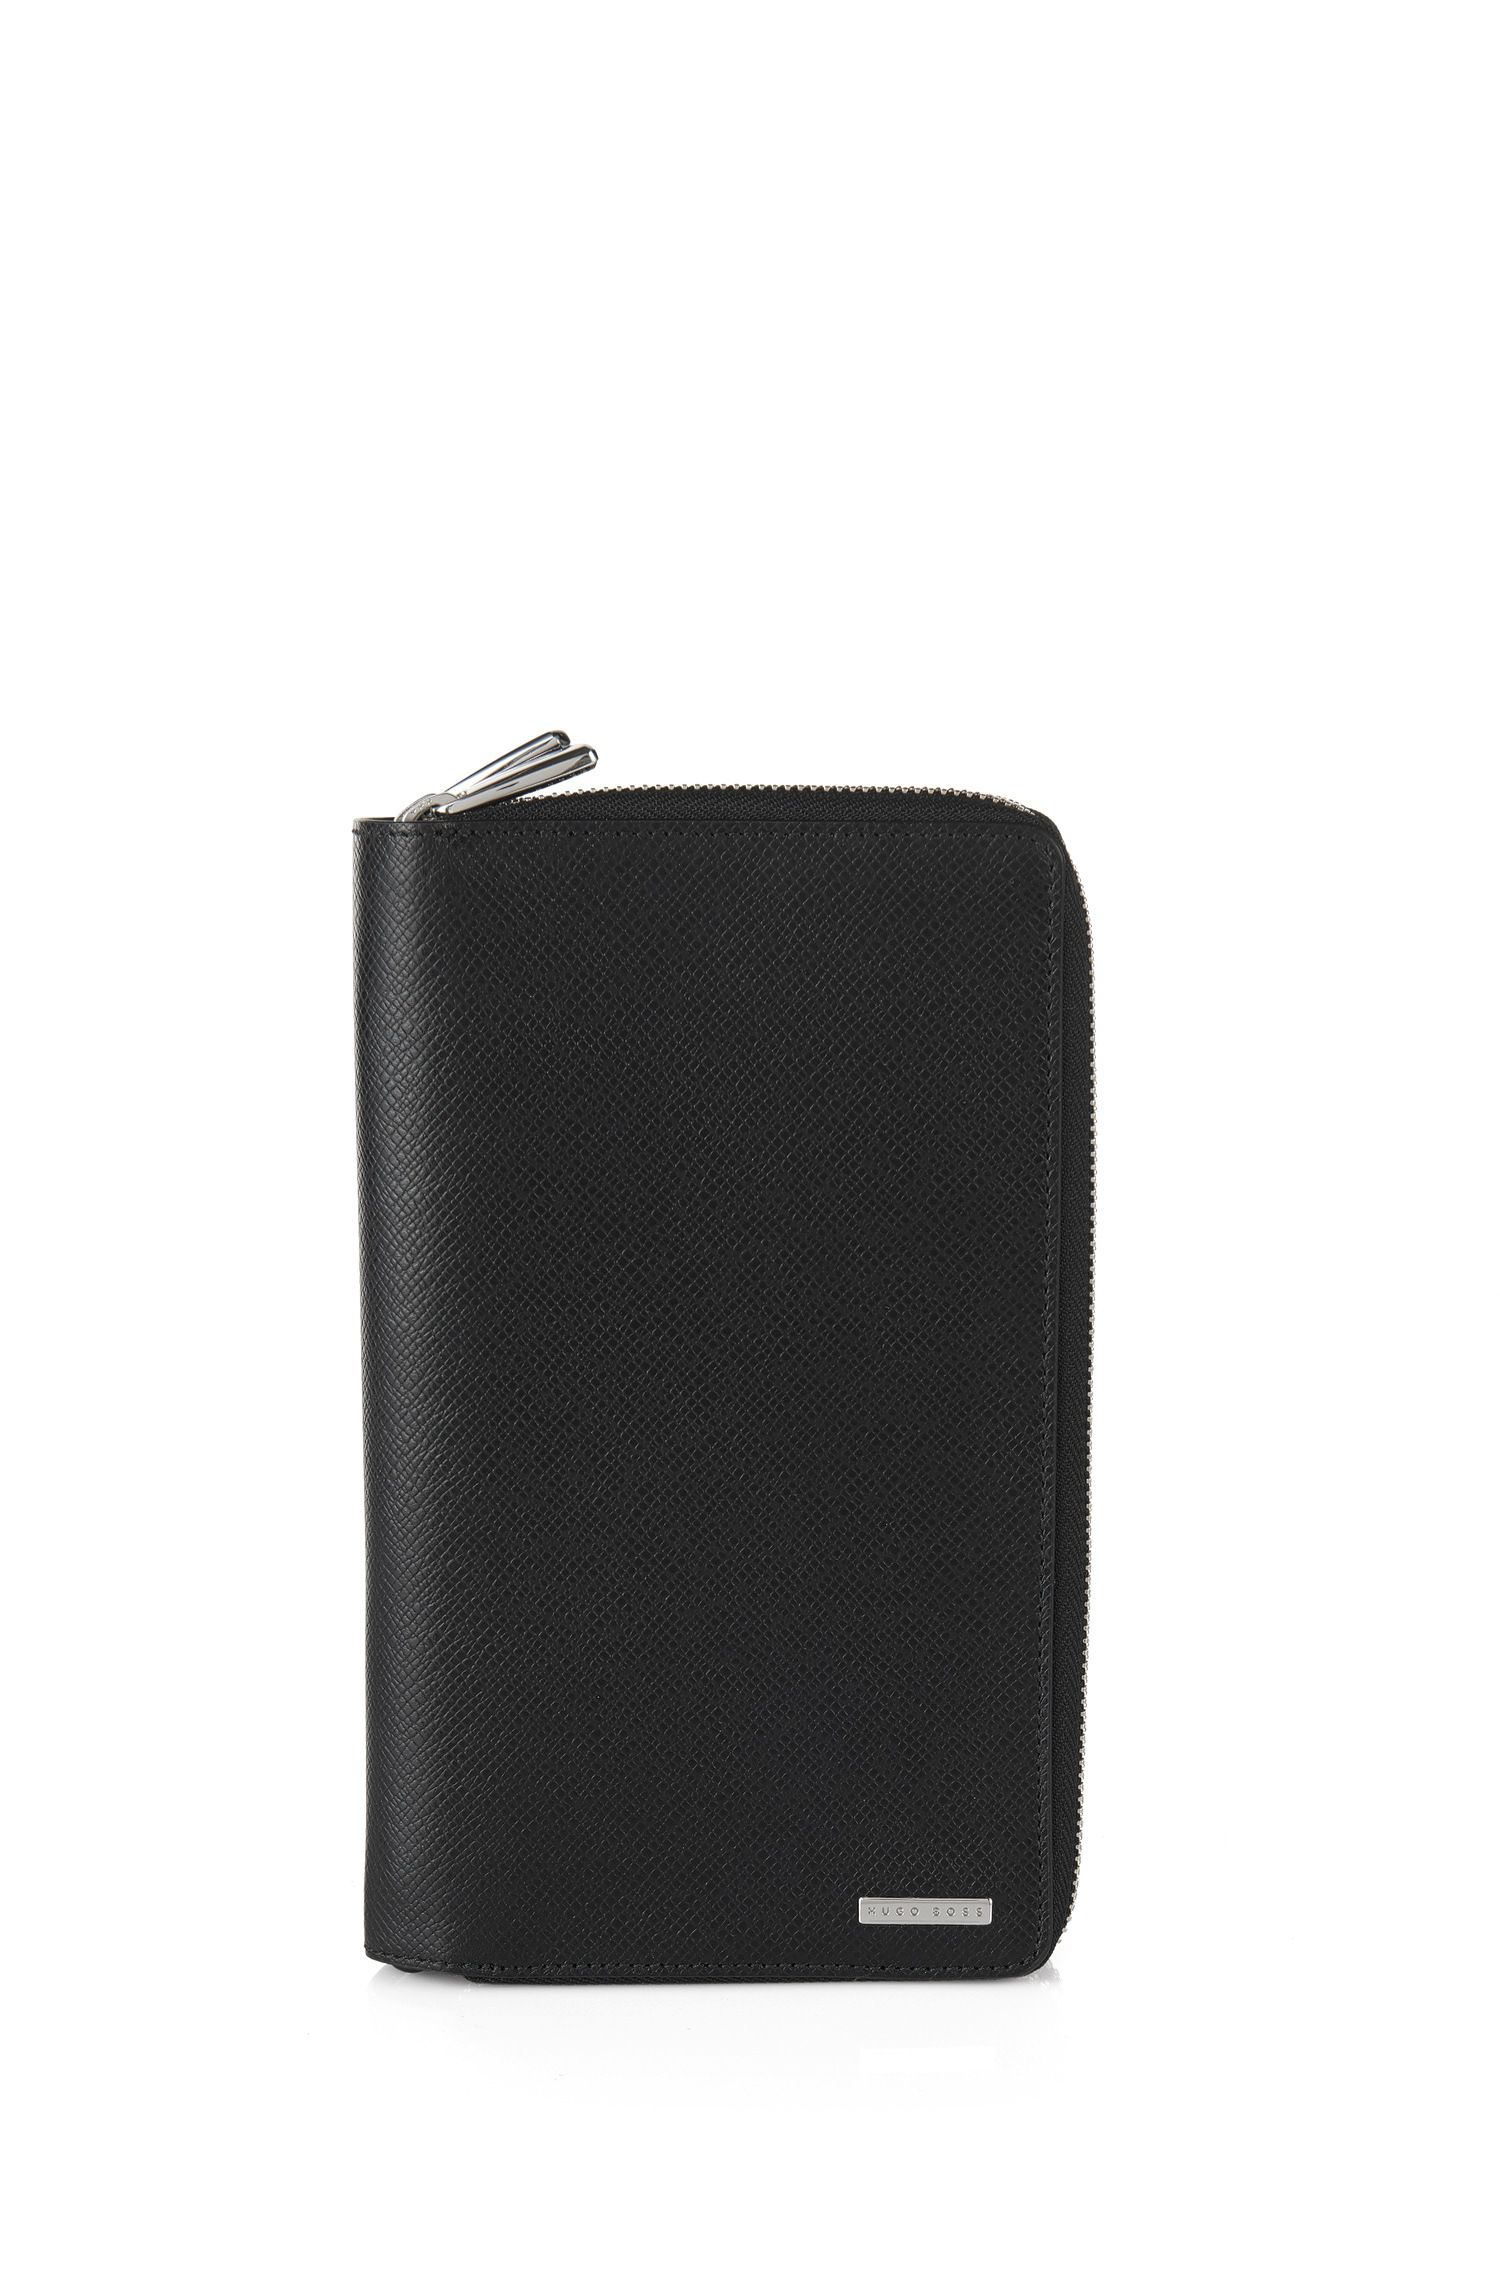 'Signature_D Zip Trav' | Leather Travel Organizer, Black